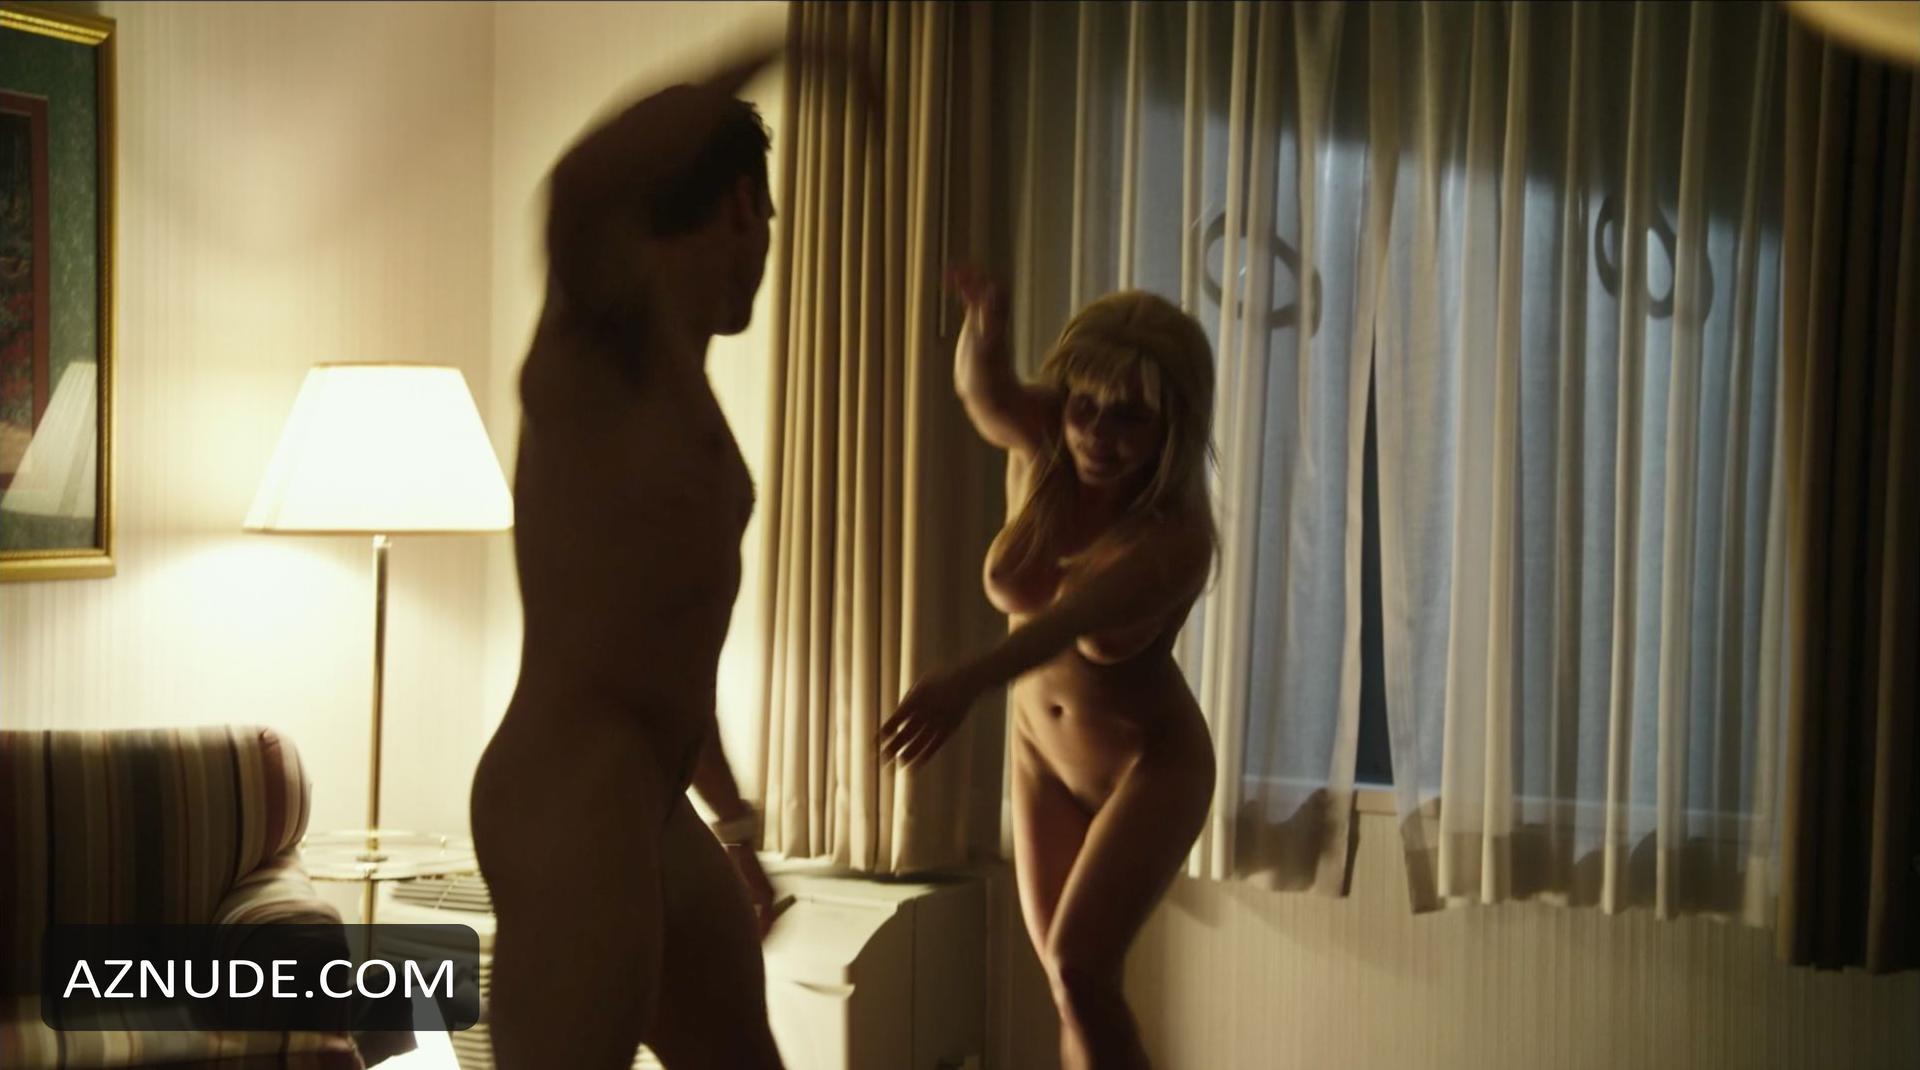 nude Dakota pussy johnson